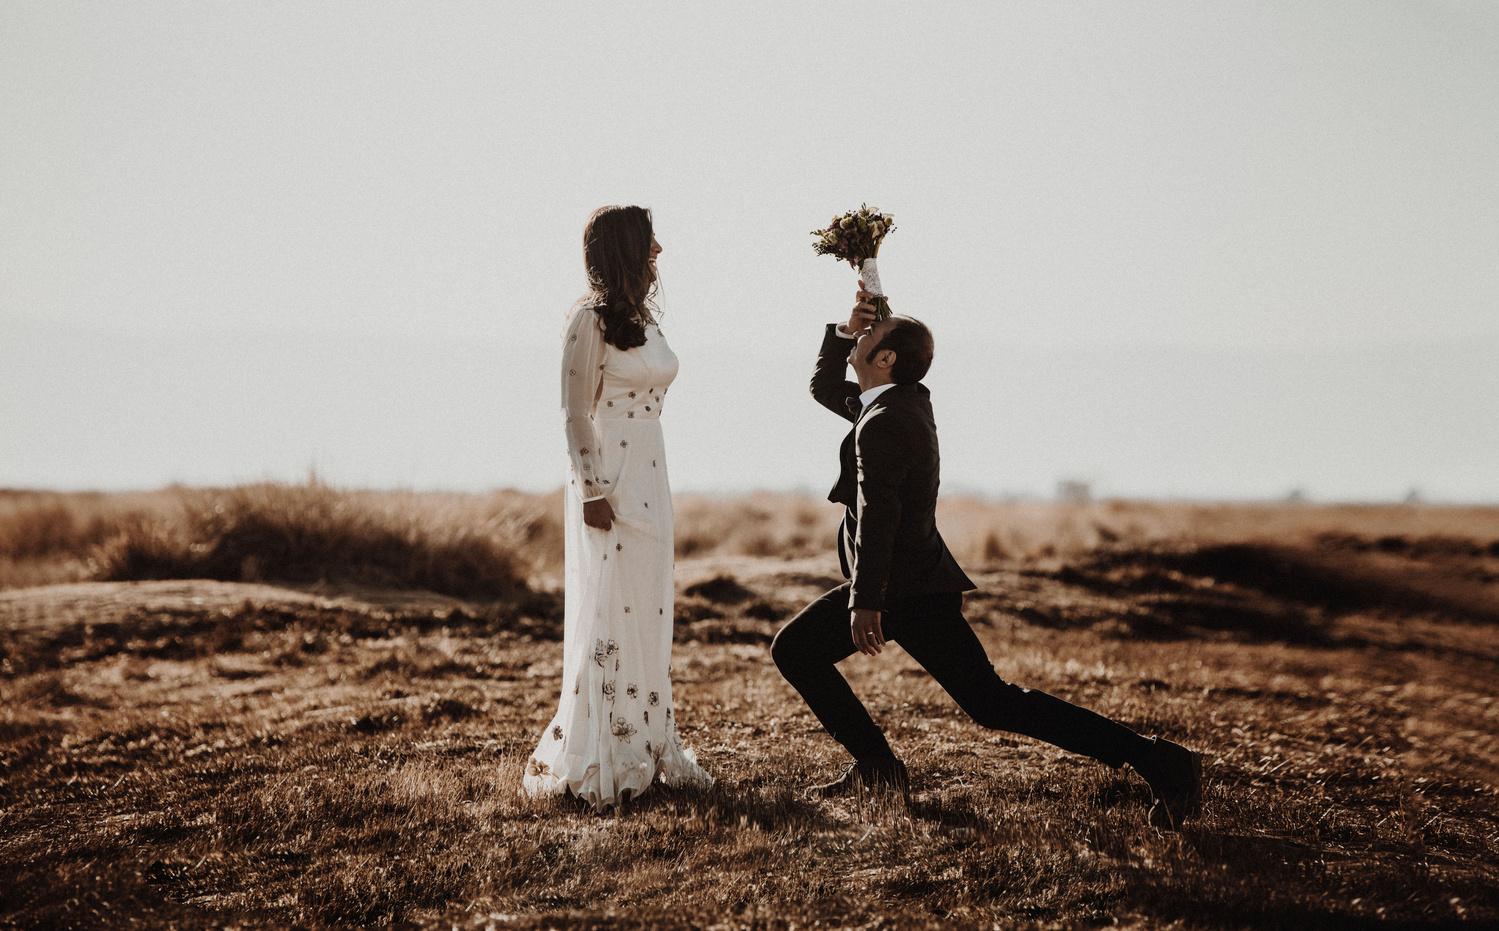 my wed by Hamze Dashtrazmi